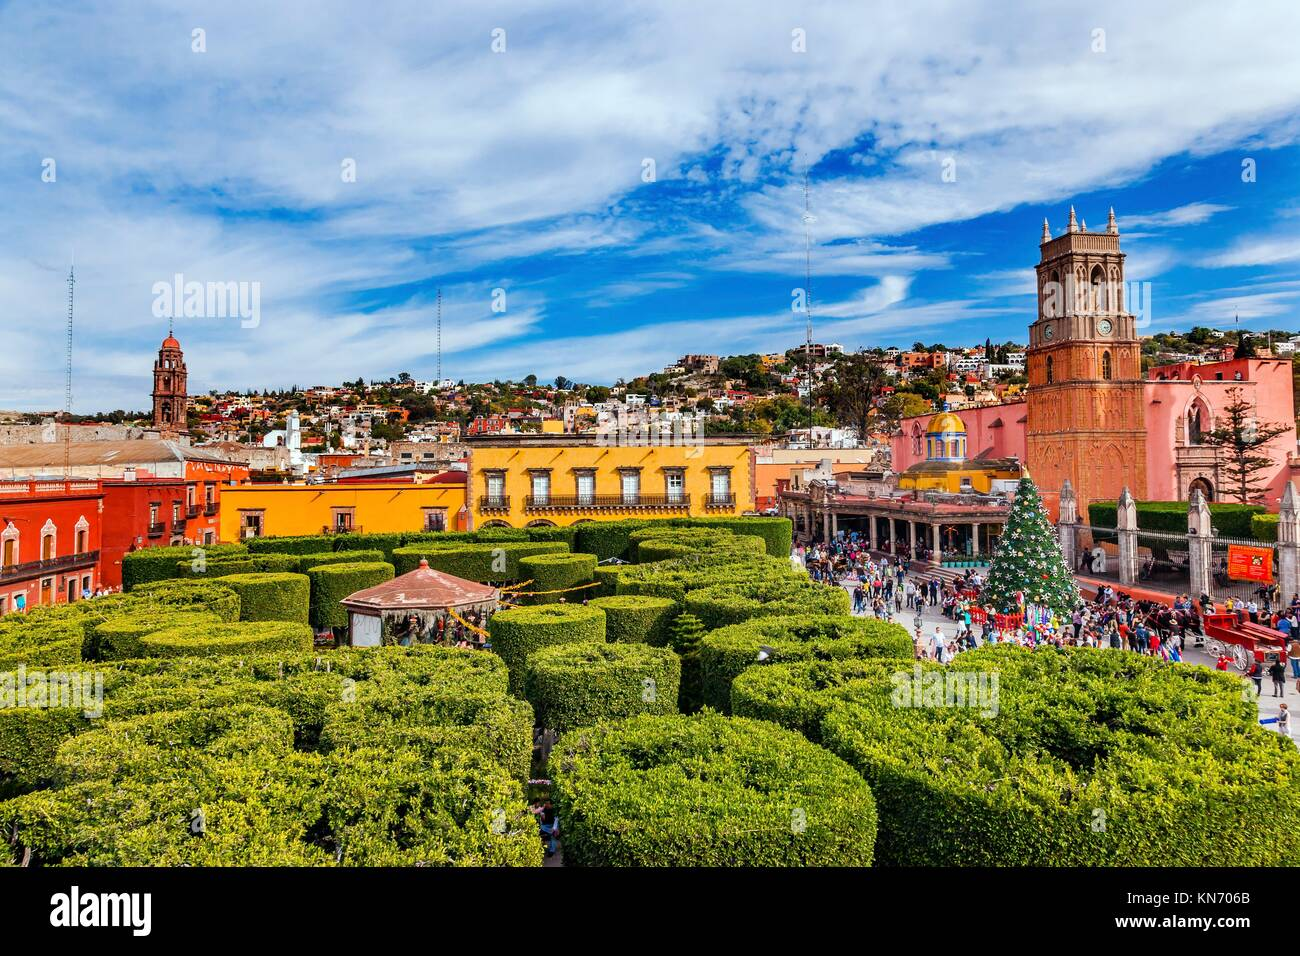 Parroquia Archangel church Greeb Jardin Town Square San Miguel de Allende, Mexico. Parroaguia created in 1600s.. - Stock Image